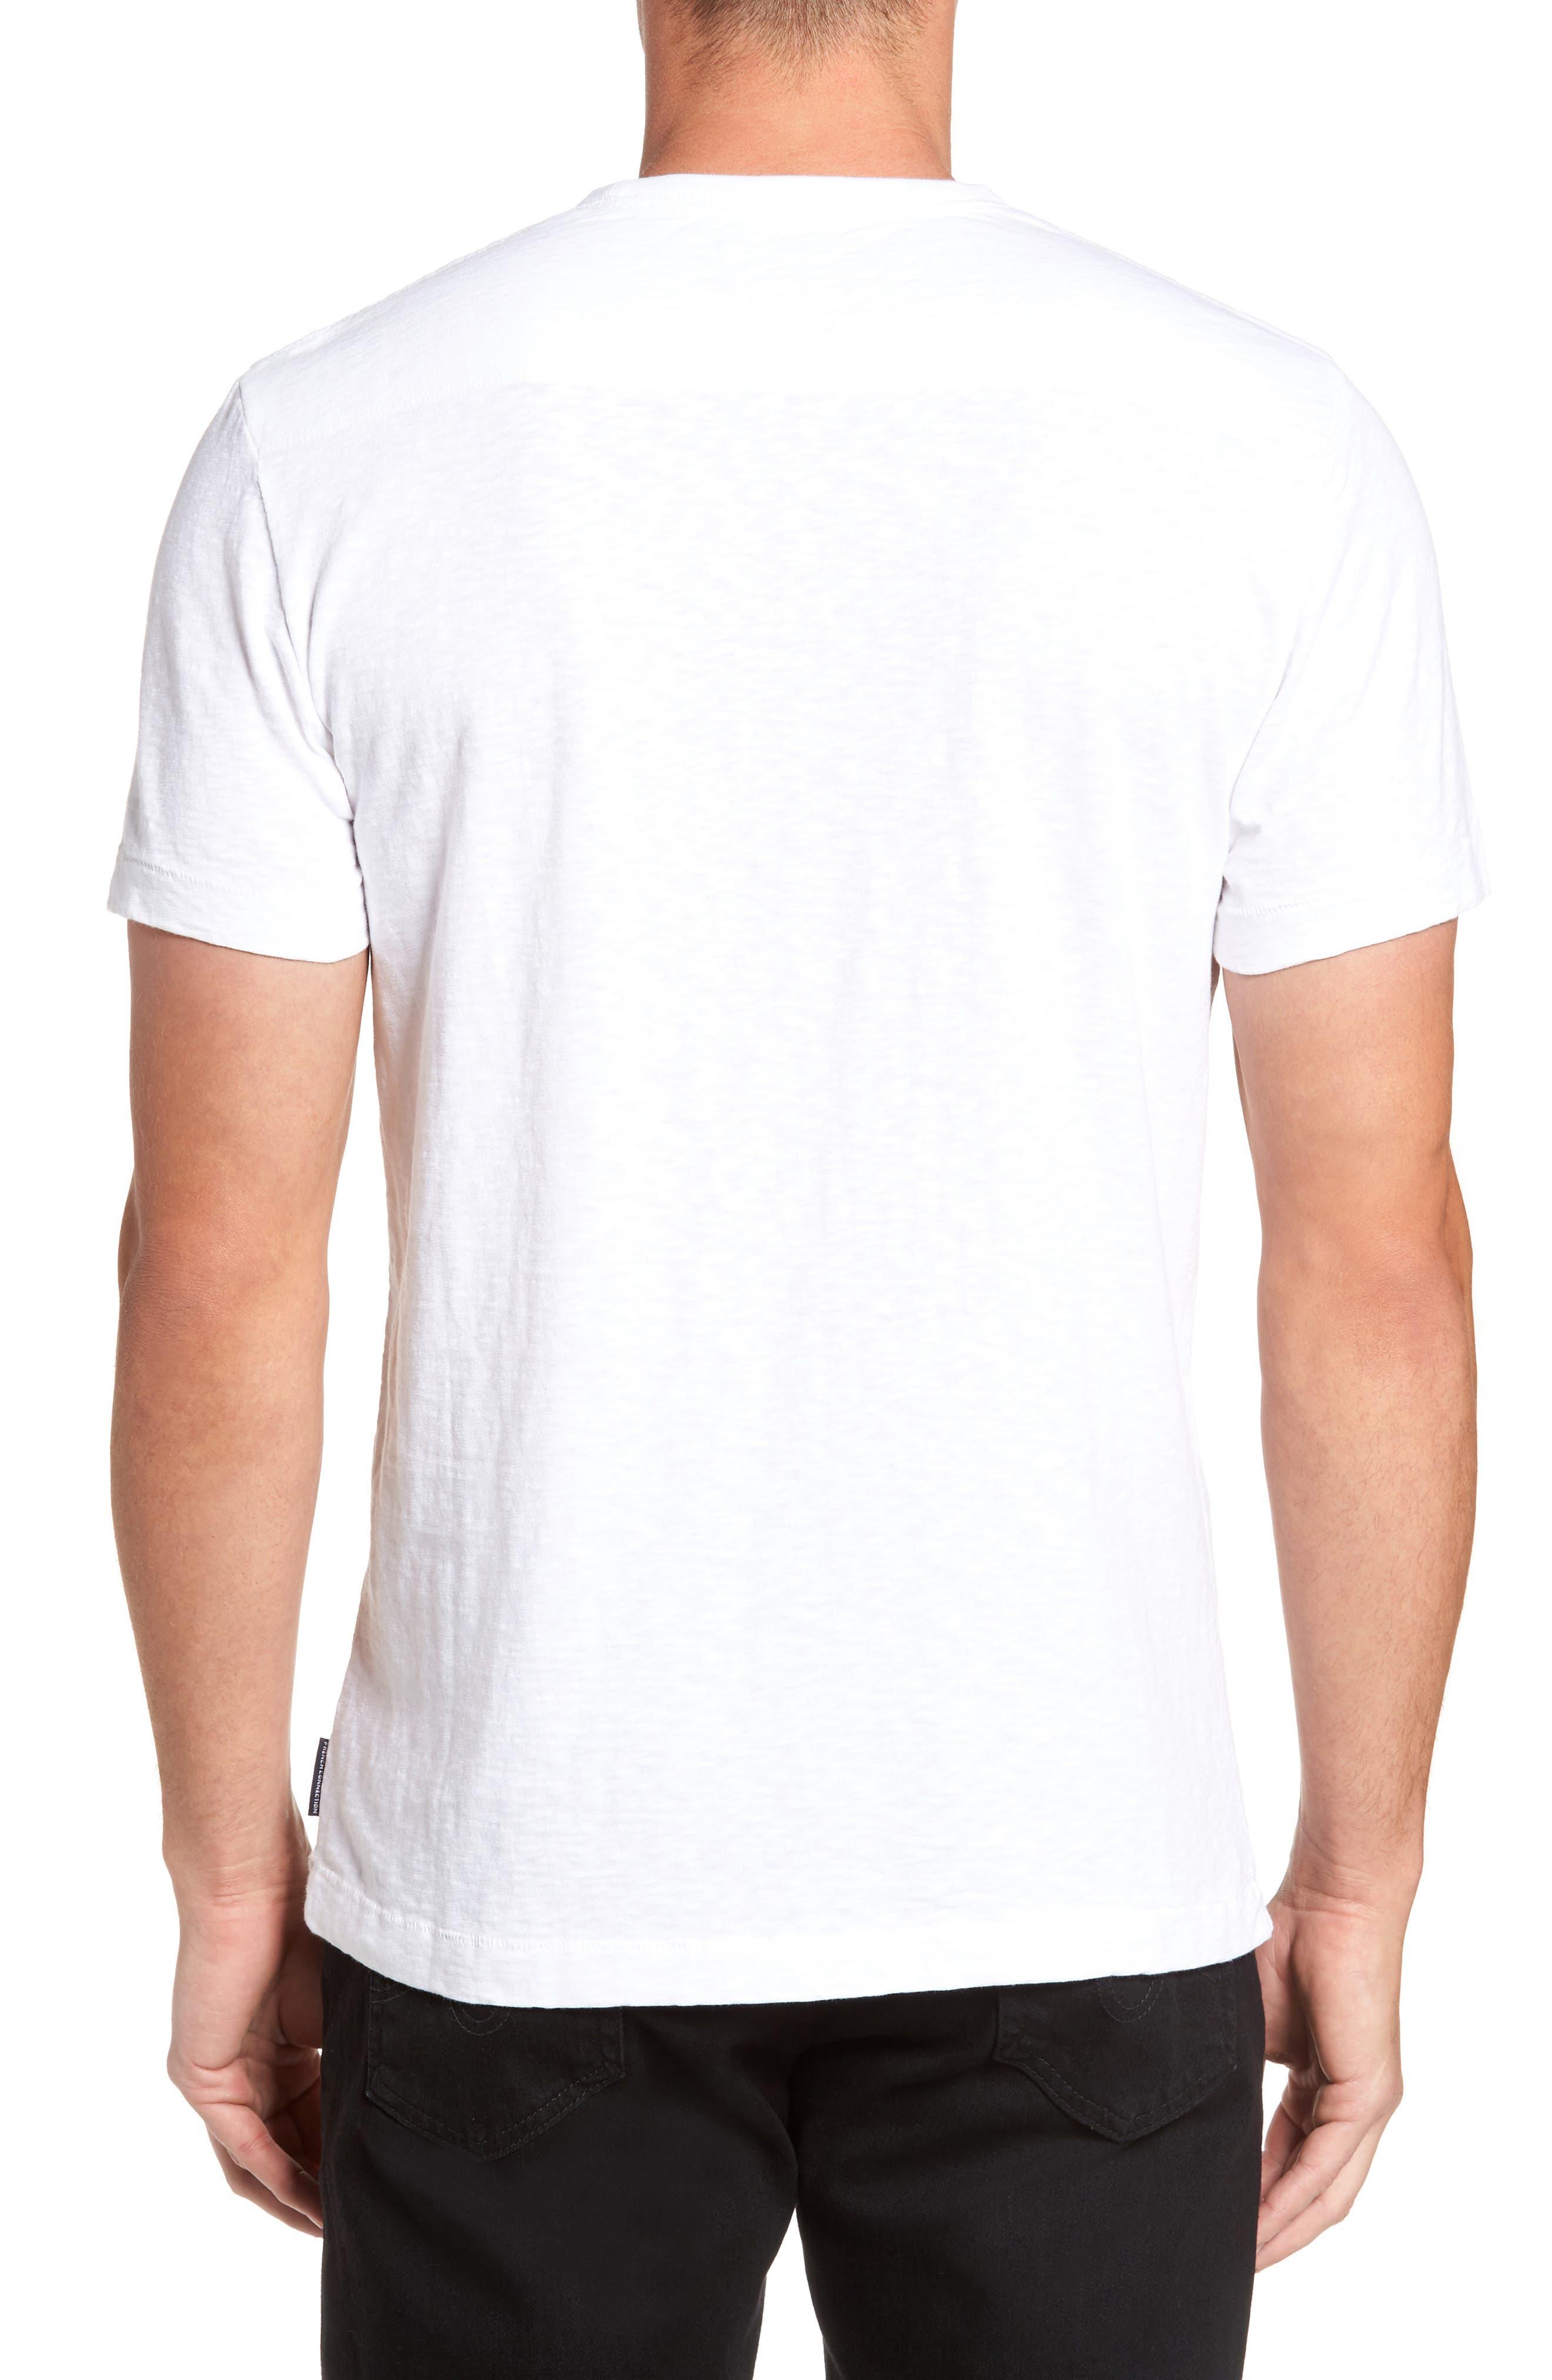 Love Hands Graphic T-Shirt,                             Alternate thumbnail 2, color,                             White/ Black